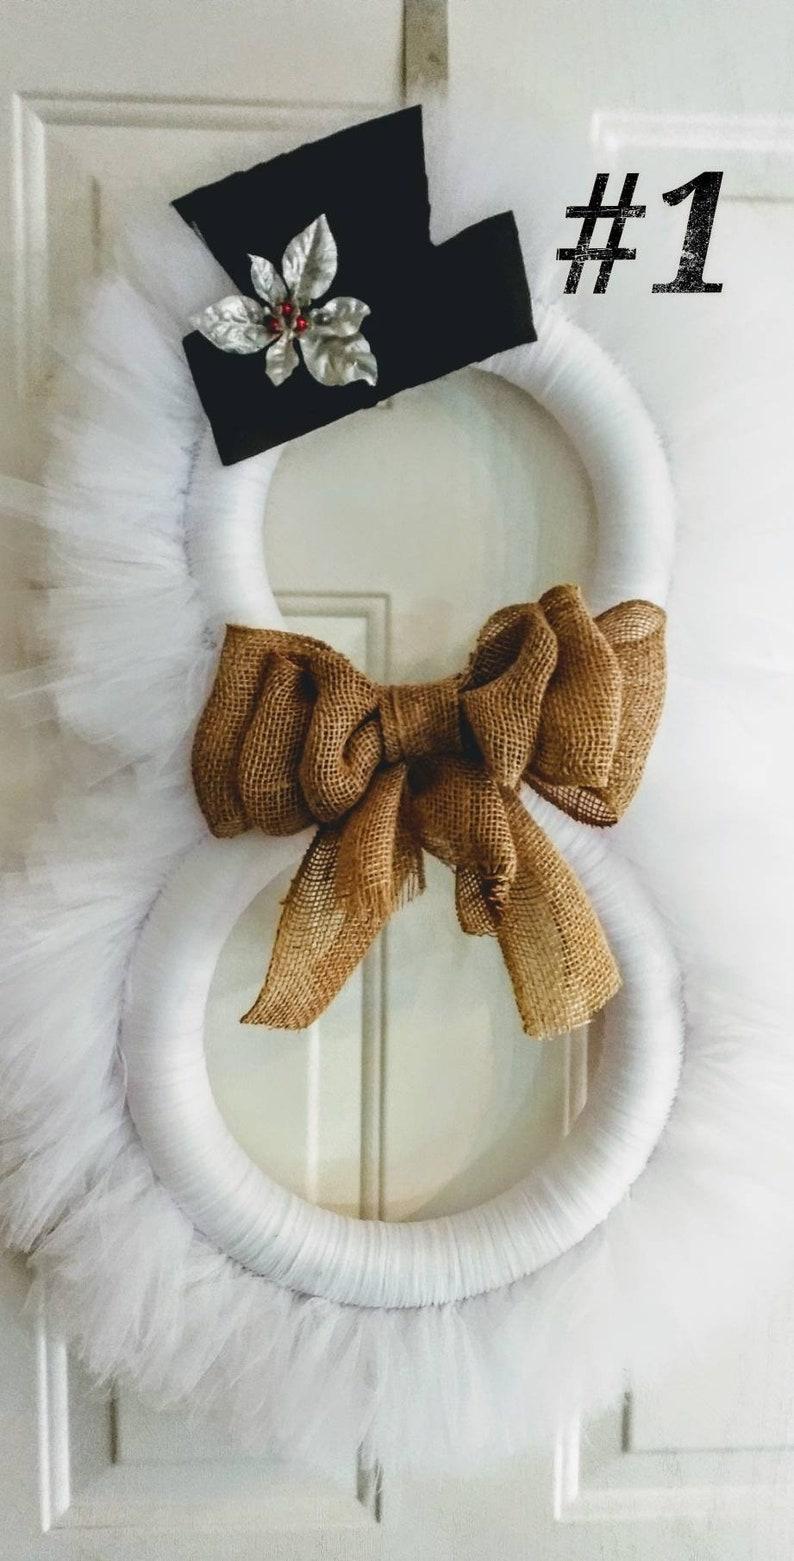 NEW Snowman Tulle Winter Wreath image 0